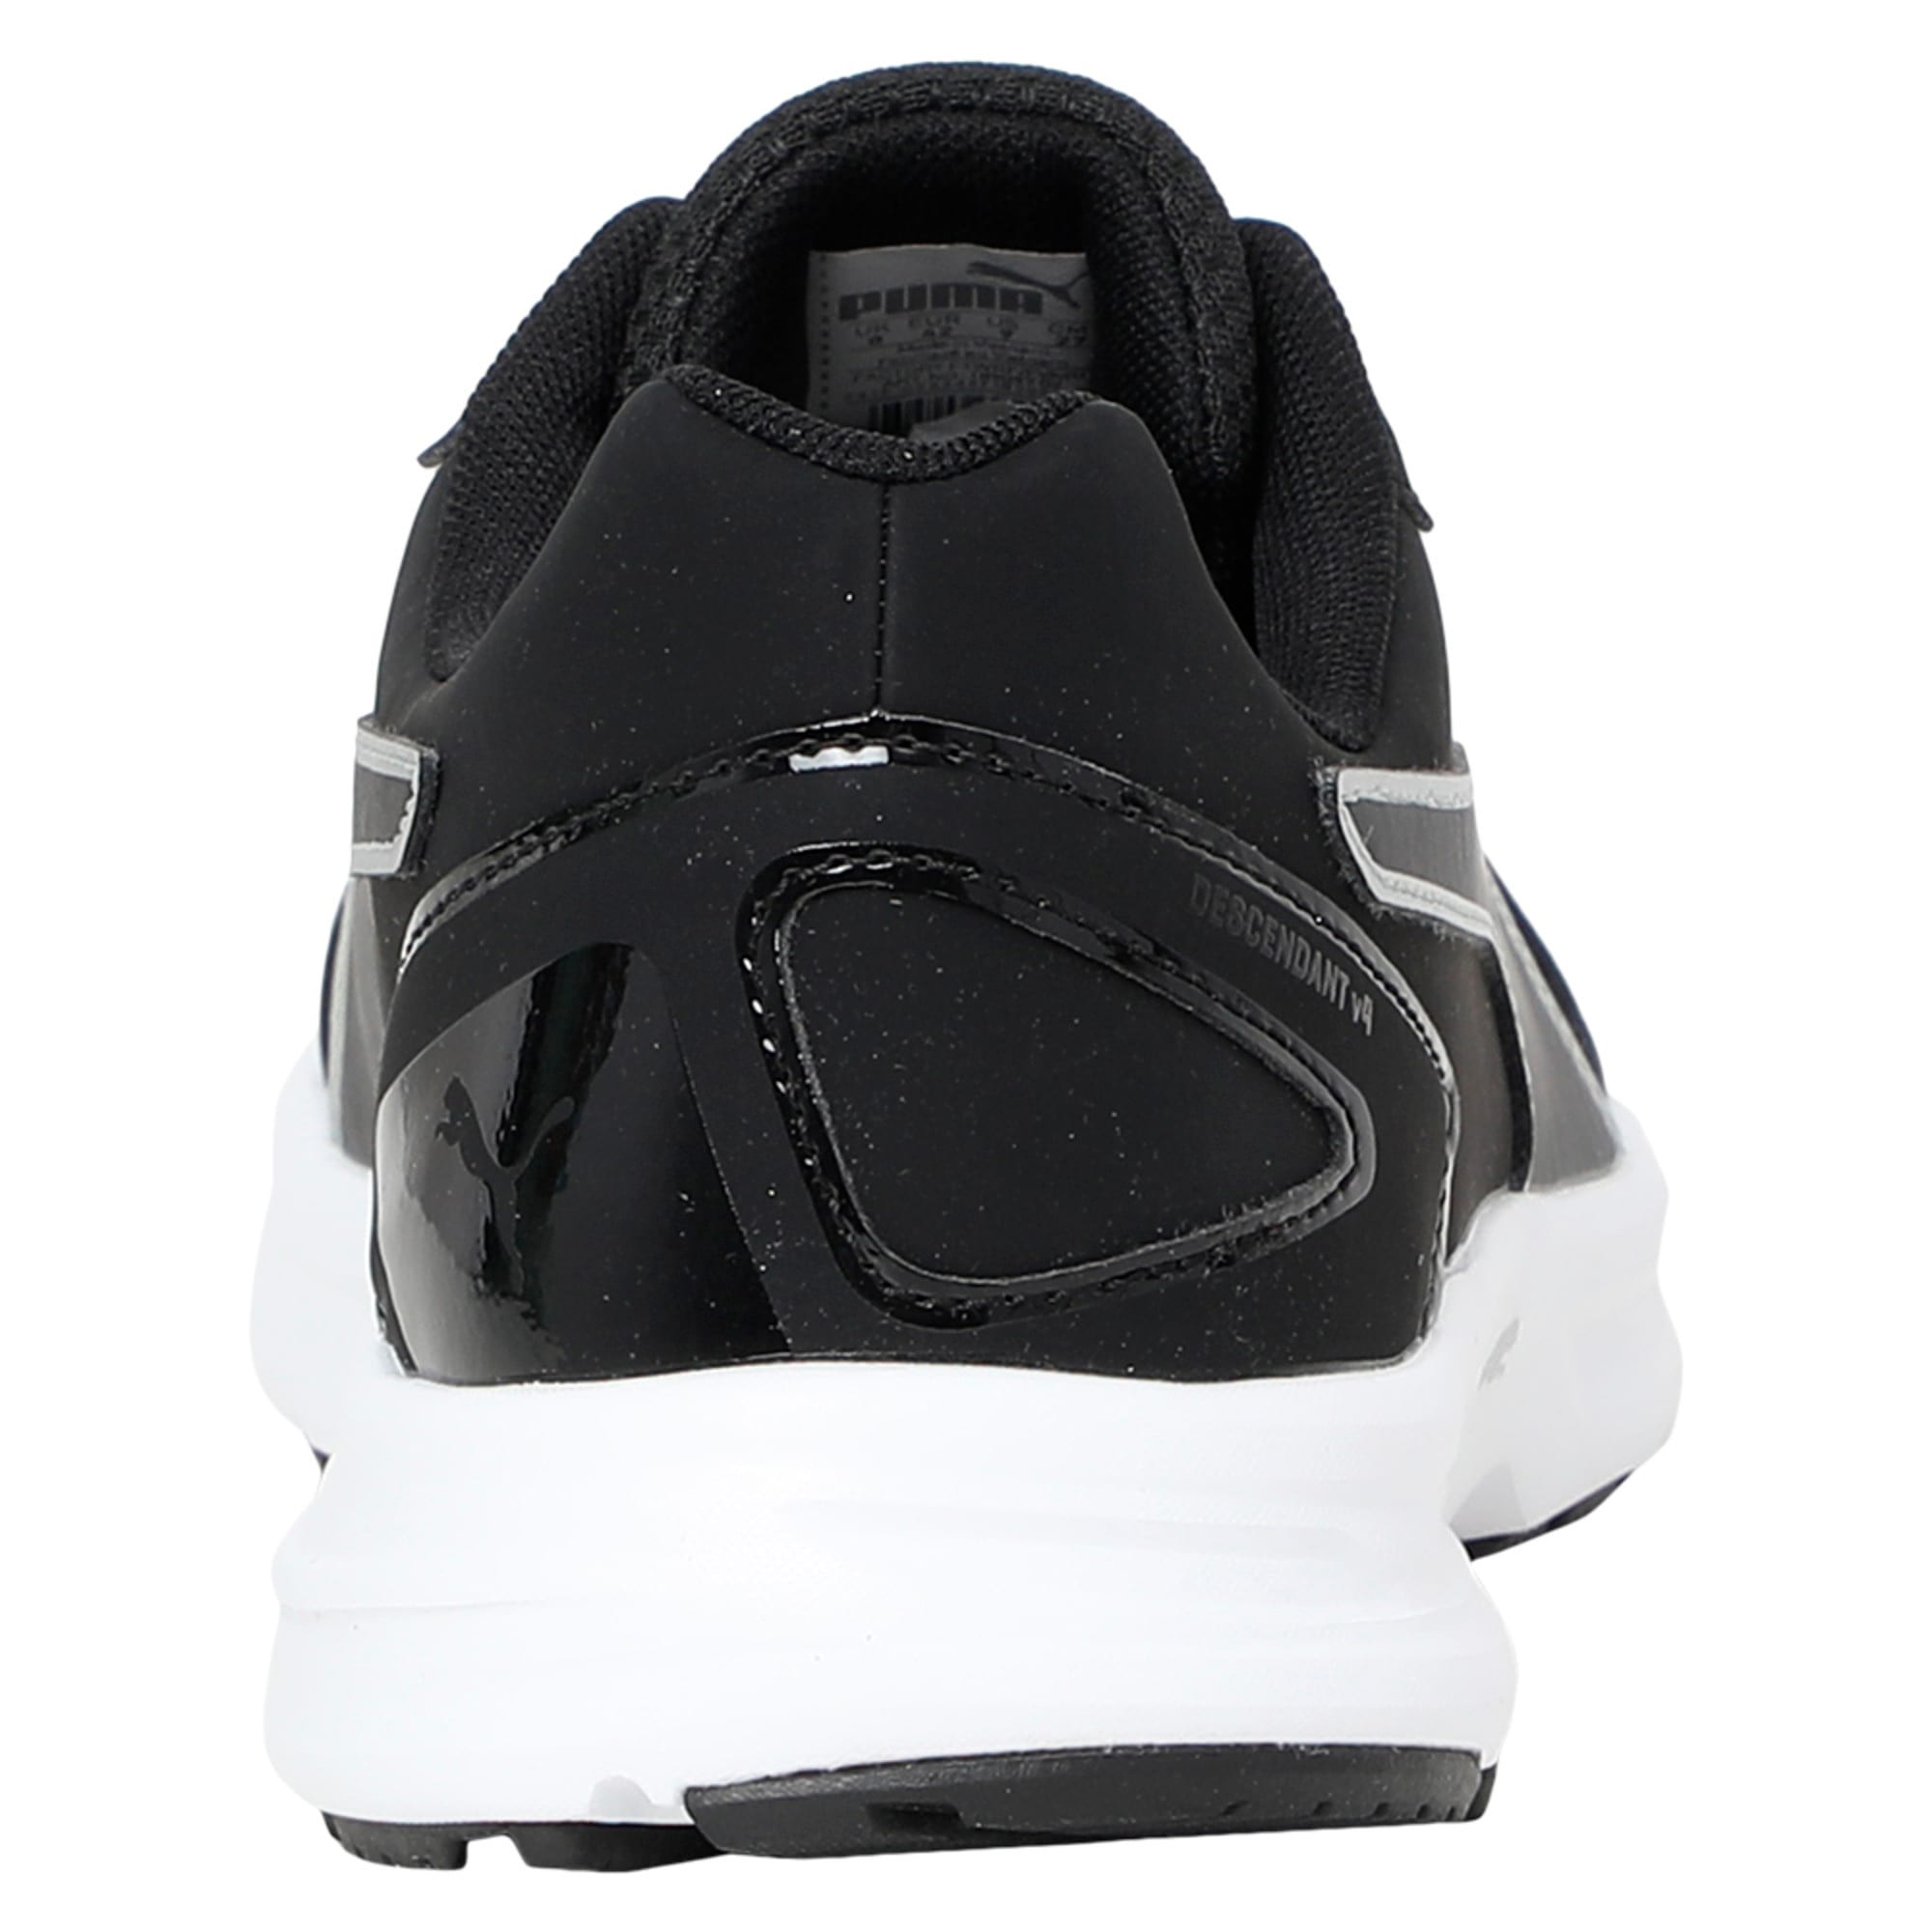 Thumbnail 4 of Descendant v4 SL Running Shoes, Puma Black-Puma Silver, medium-IND